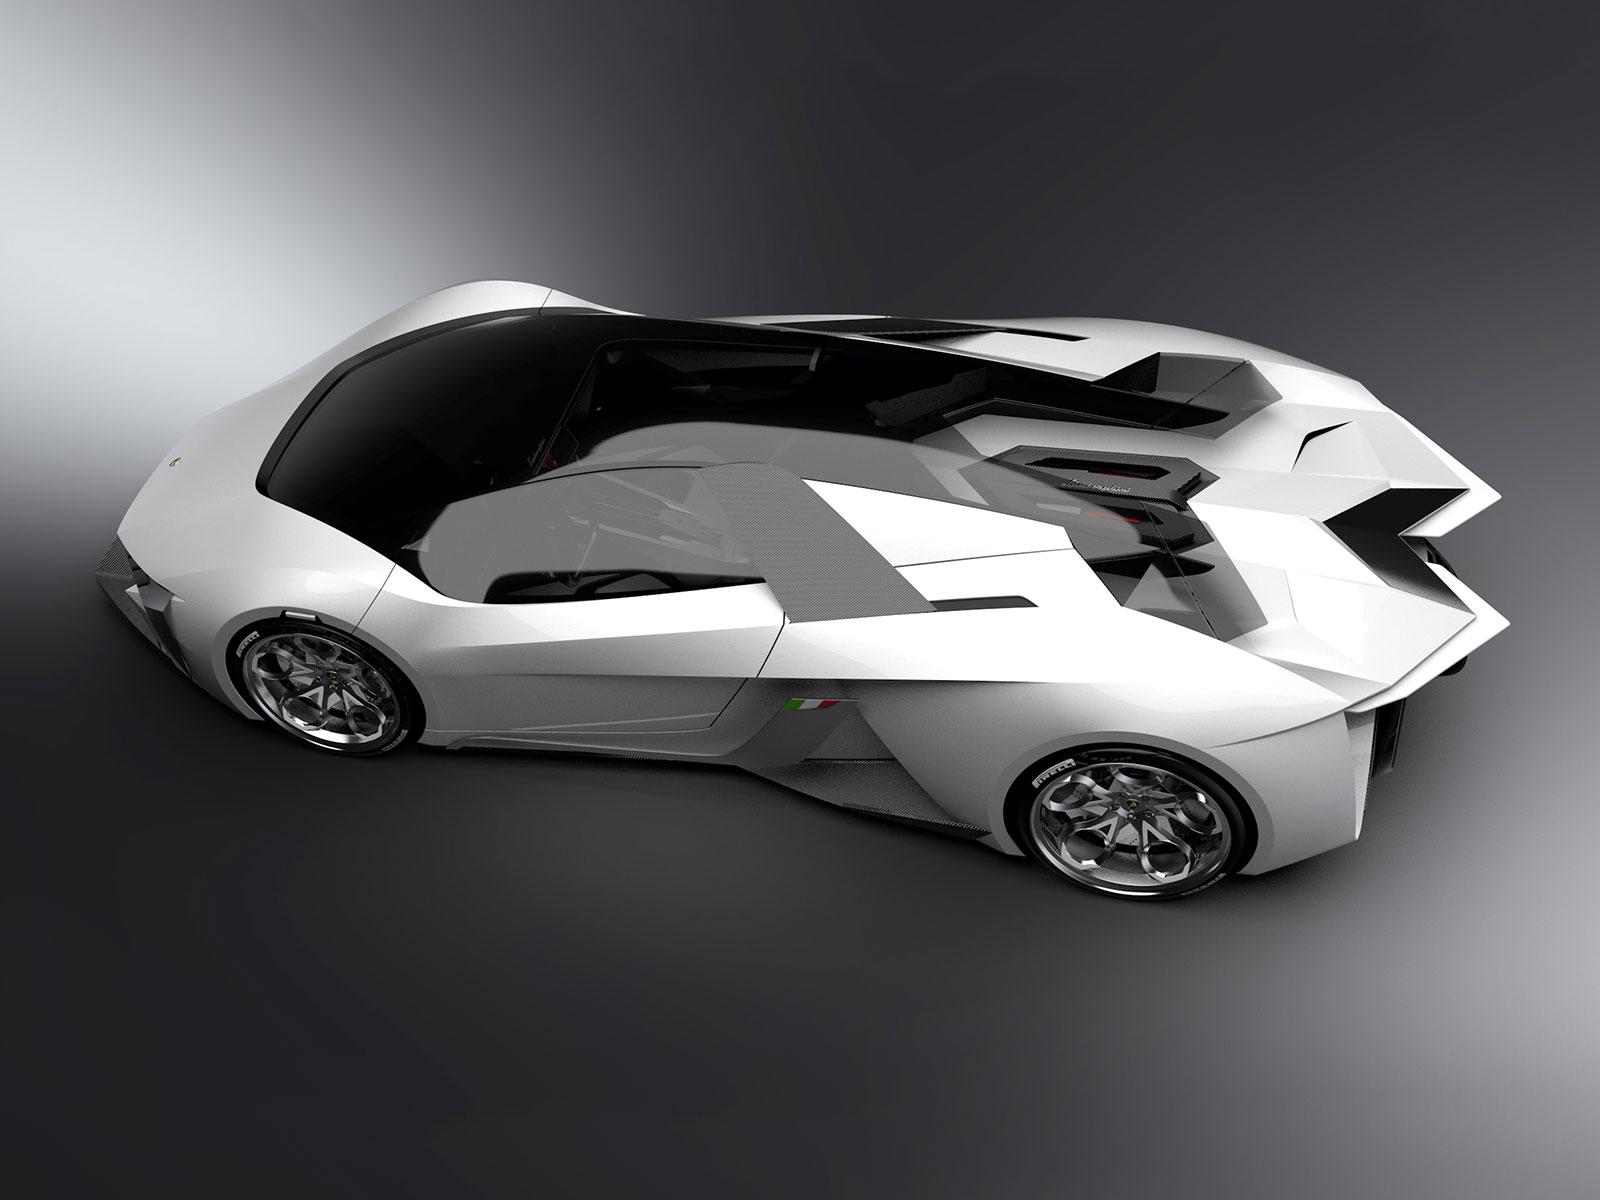 http://3.bp.blogspot.com/-dR-ClkCKBPw/UiuvaLz2w3I/AAAAAAAApE8/THLIkf5-lDE/s1600/2013+Lamborghini+Diamante+Concept,.jpg